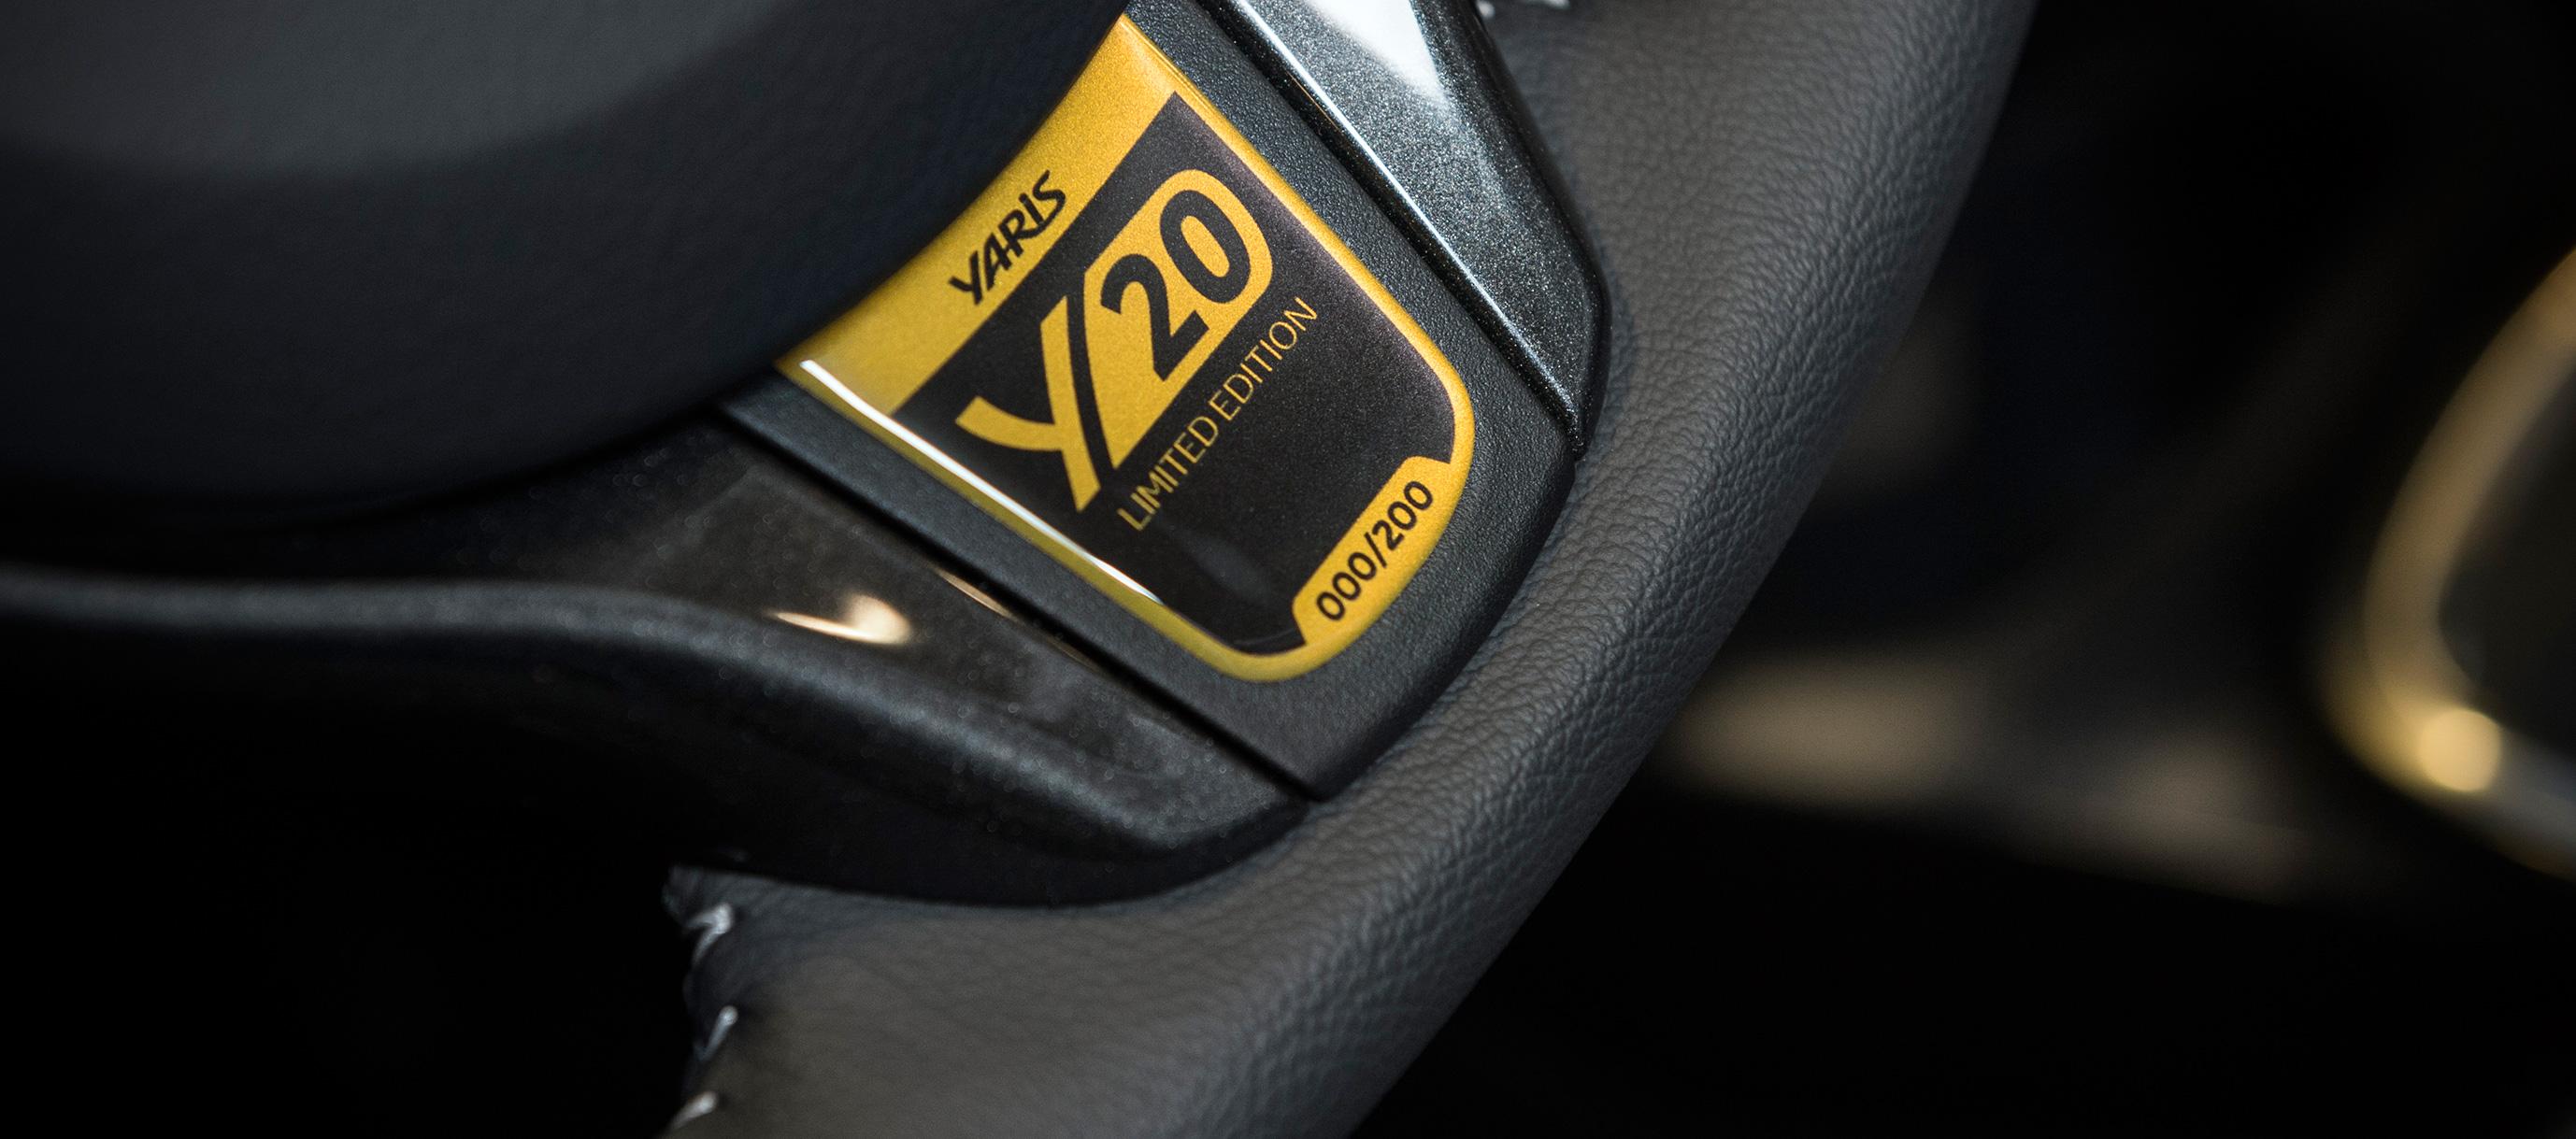 Nuevo Toyota Yaris 20 Aniversario Limited Edition